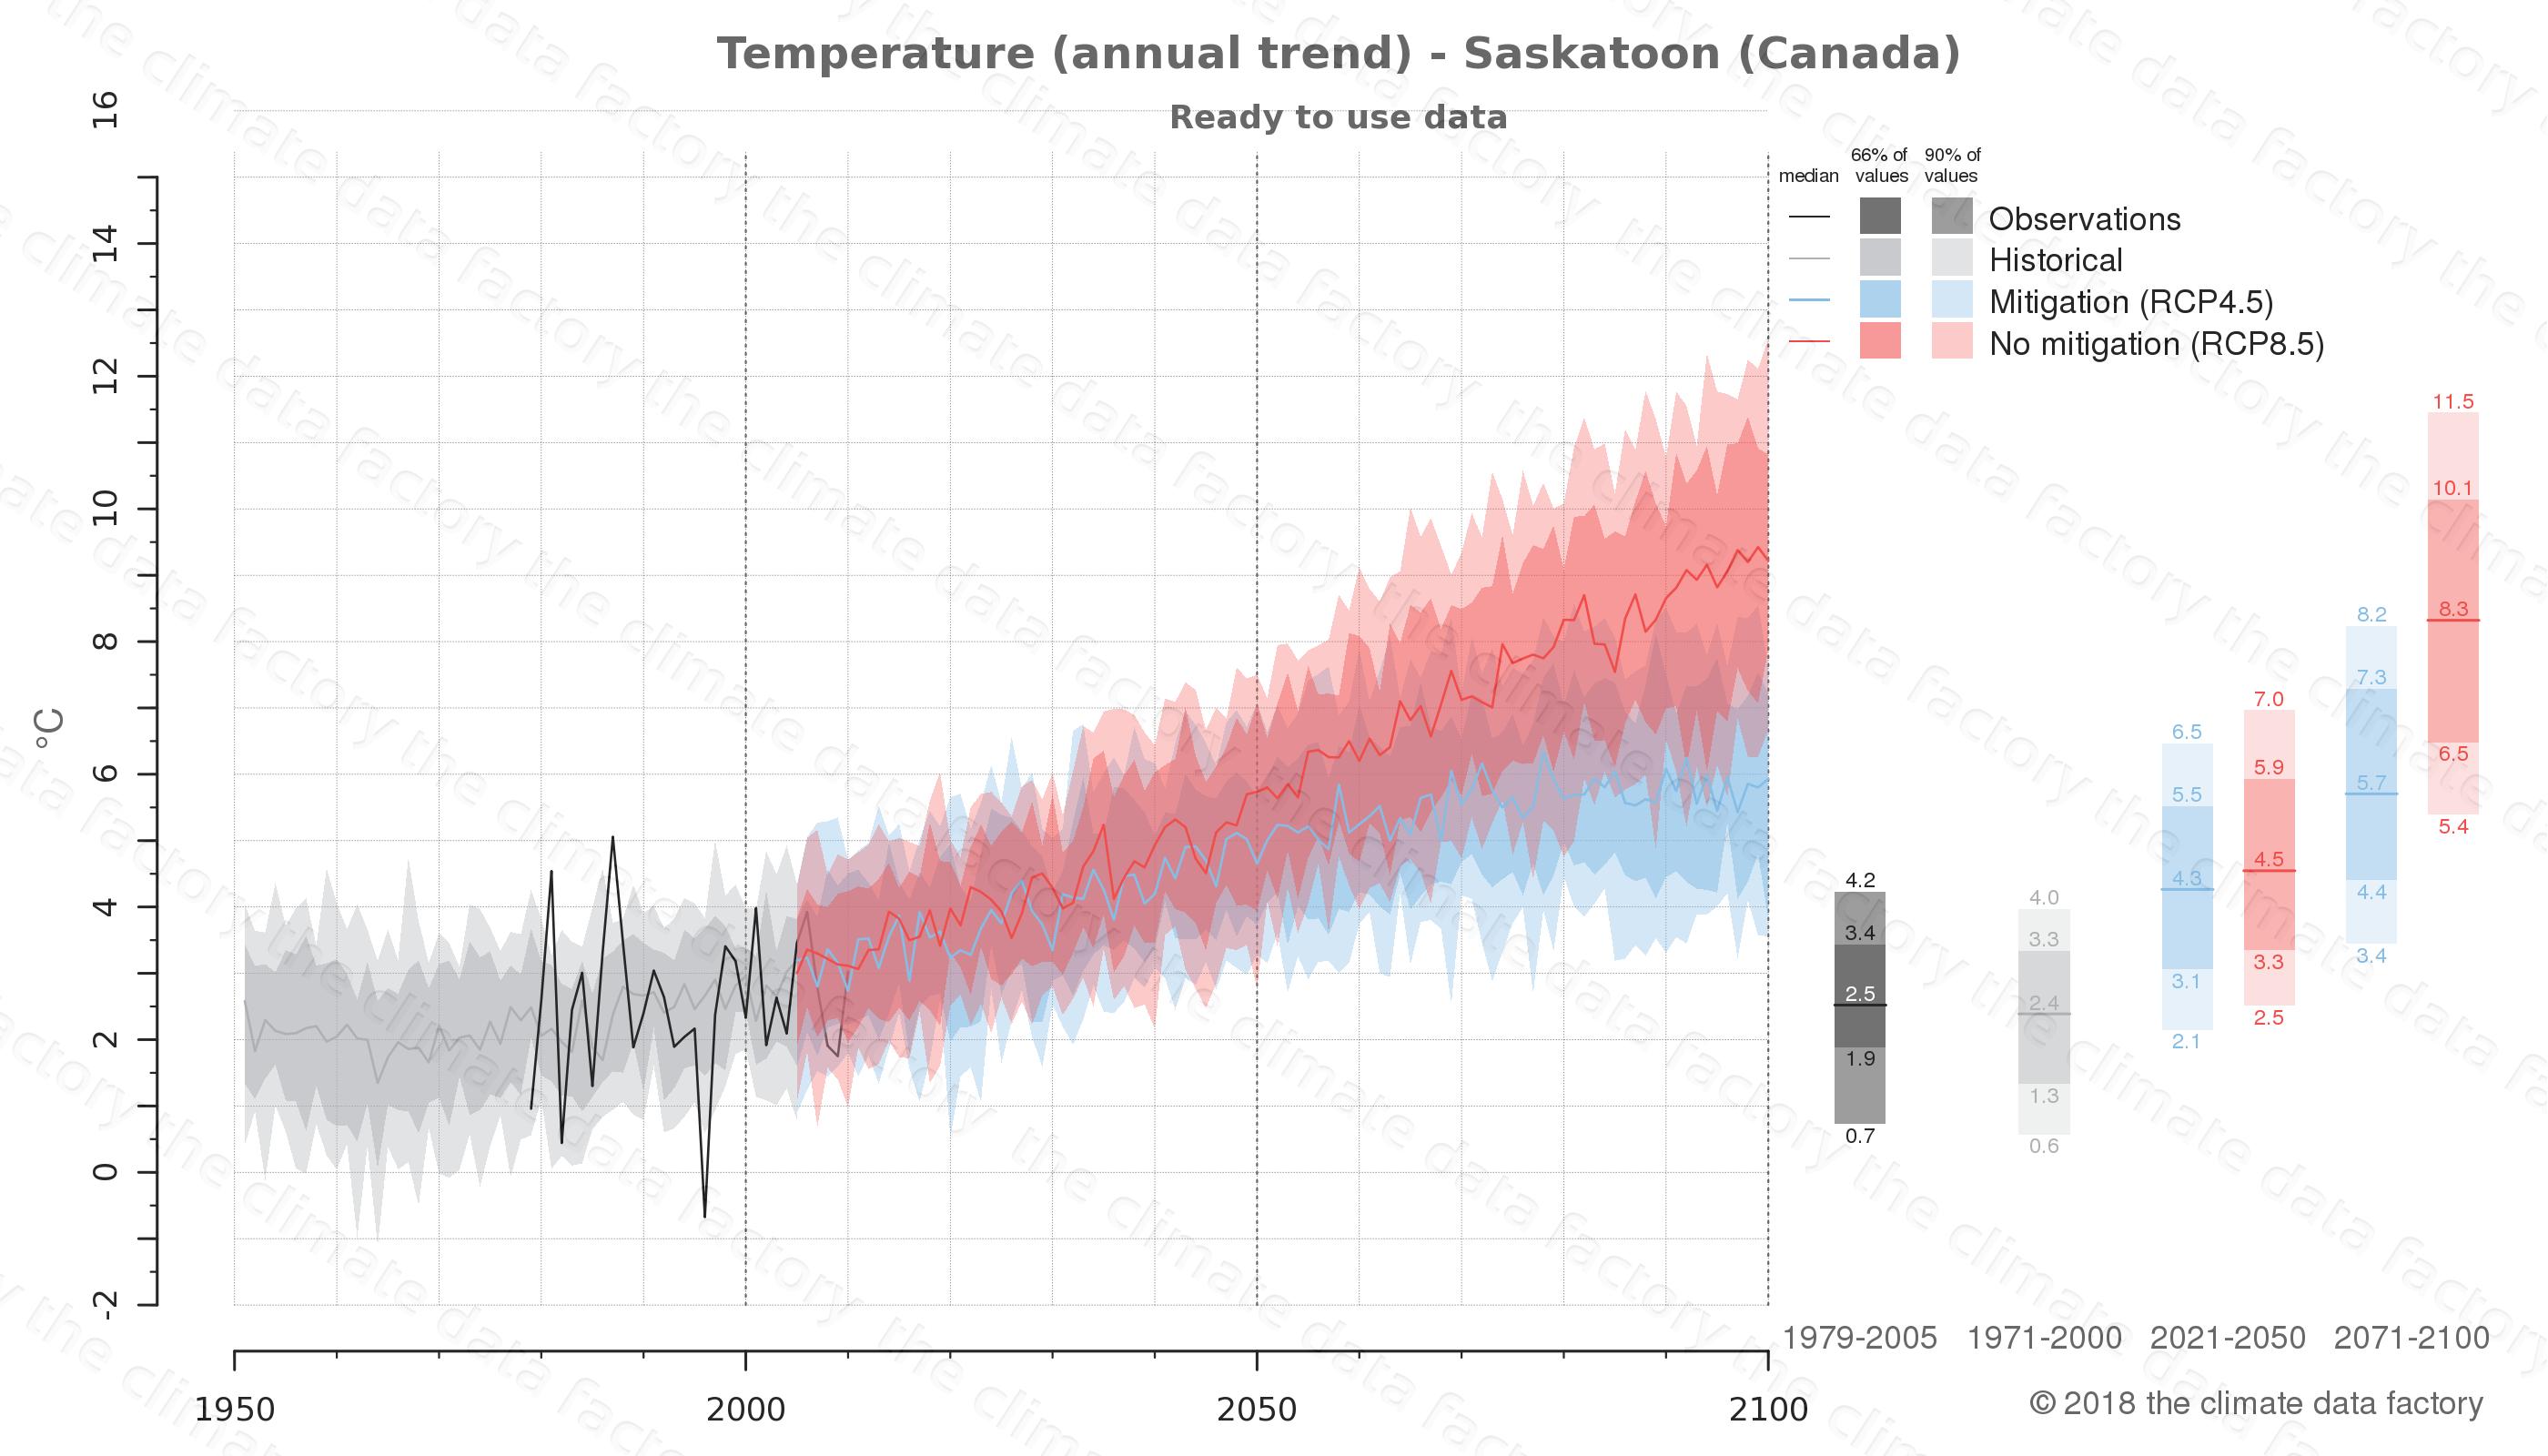 climate change data policy adaptation climate graph city data temperature saskatoon canada